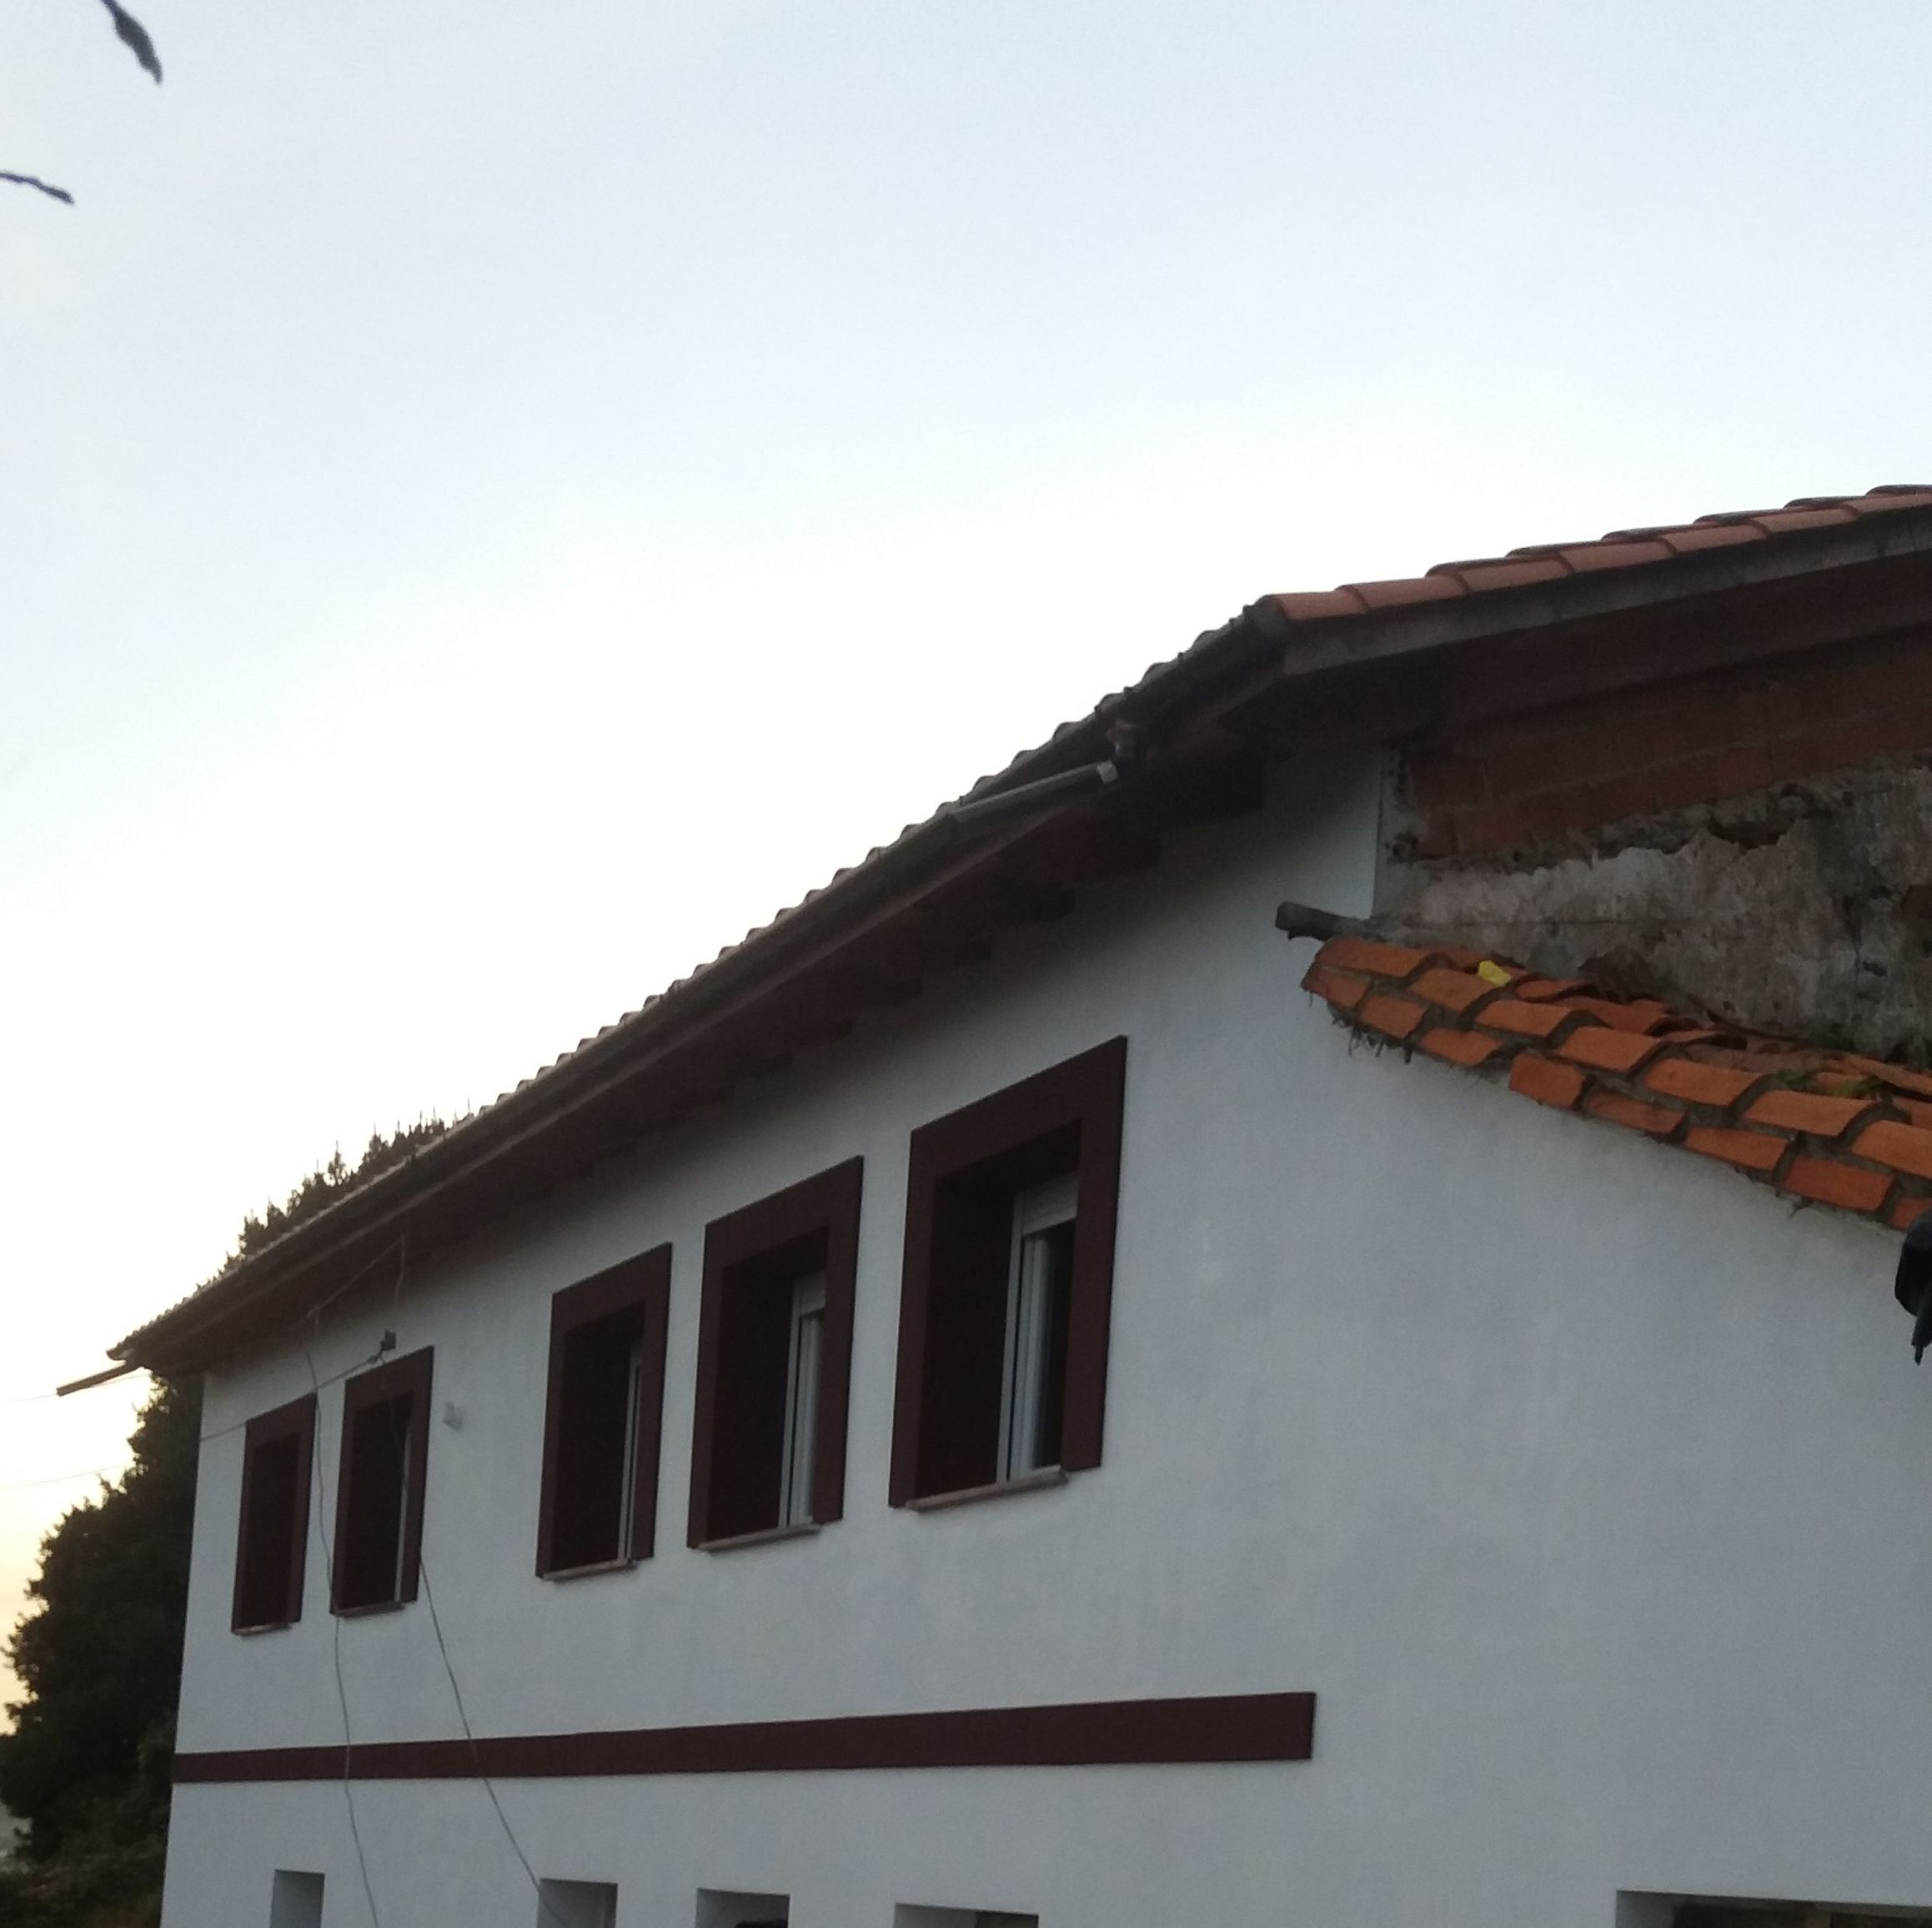 Foto 16 de Empresa de reformas en Oviedo | Asturcore